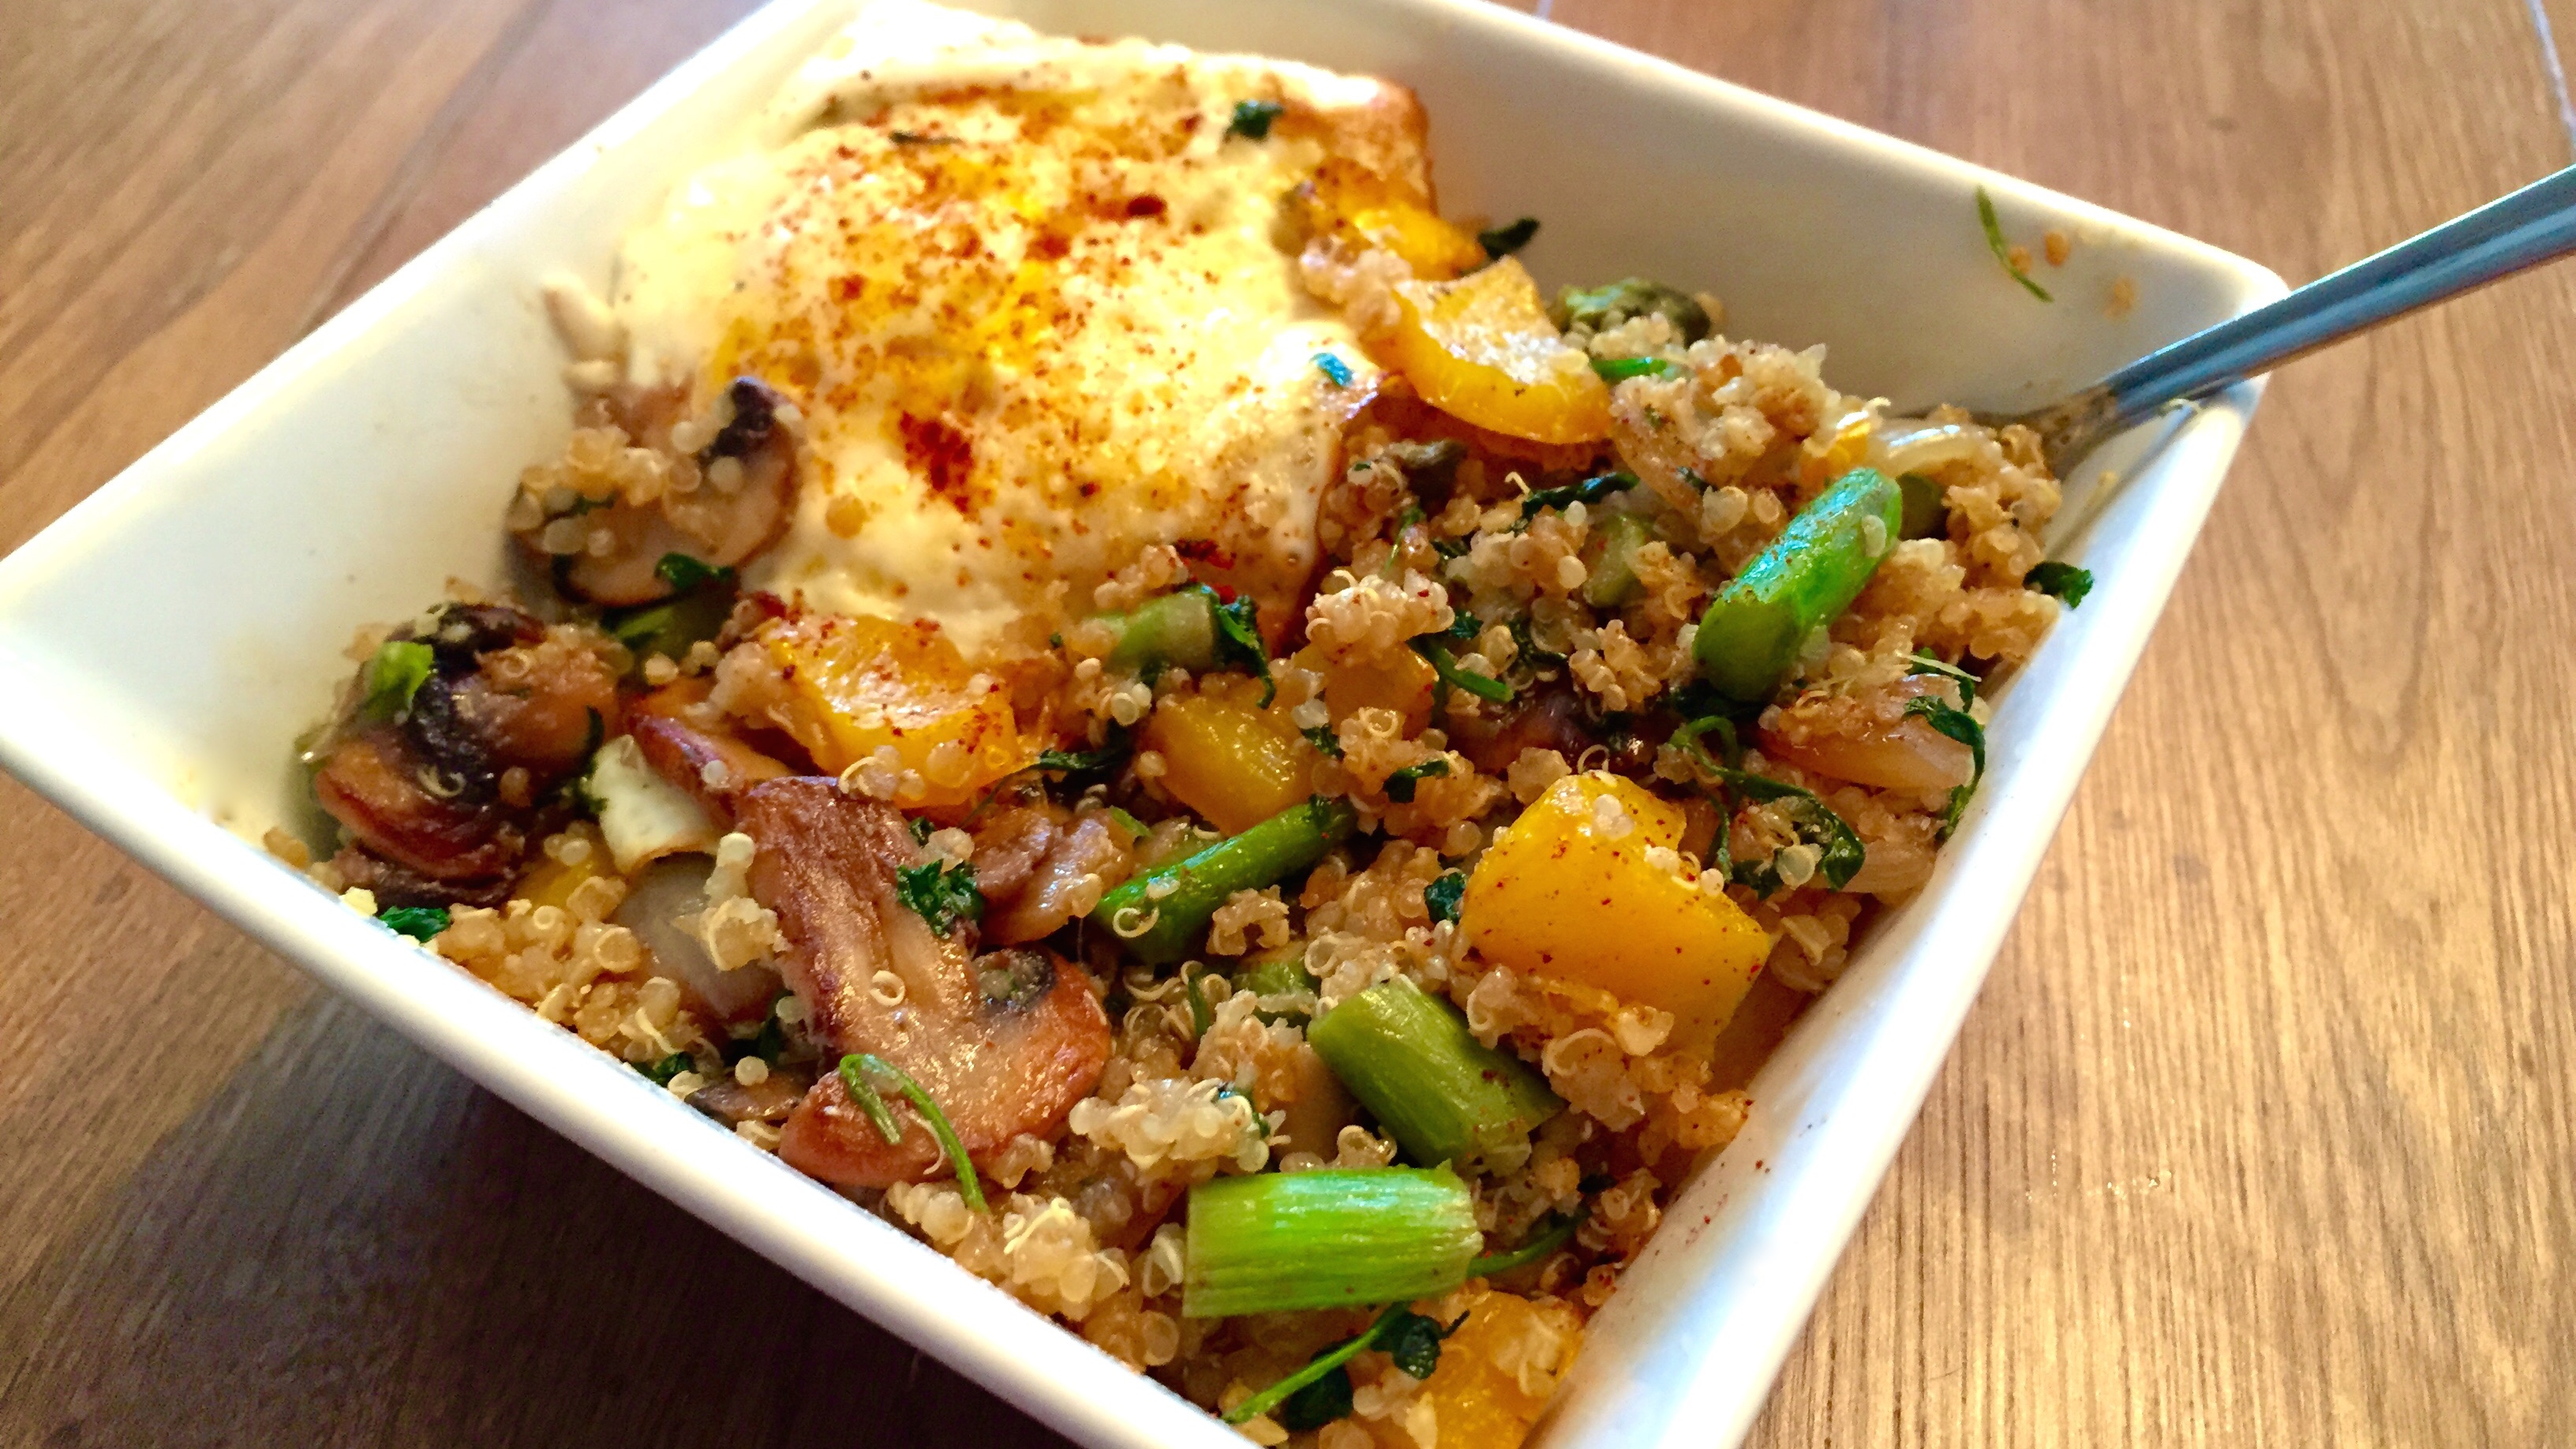 Quinoa And Veggies  Filling Whole Food Recipe